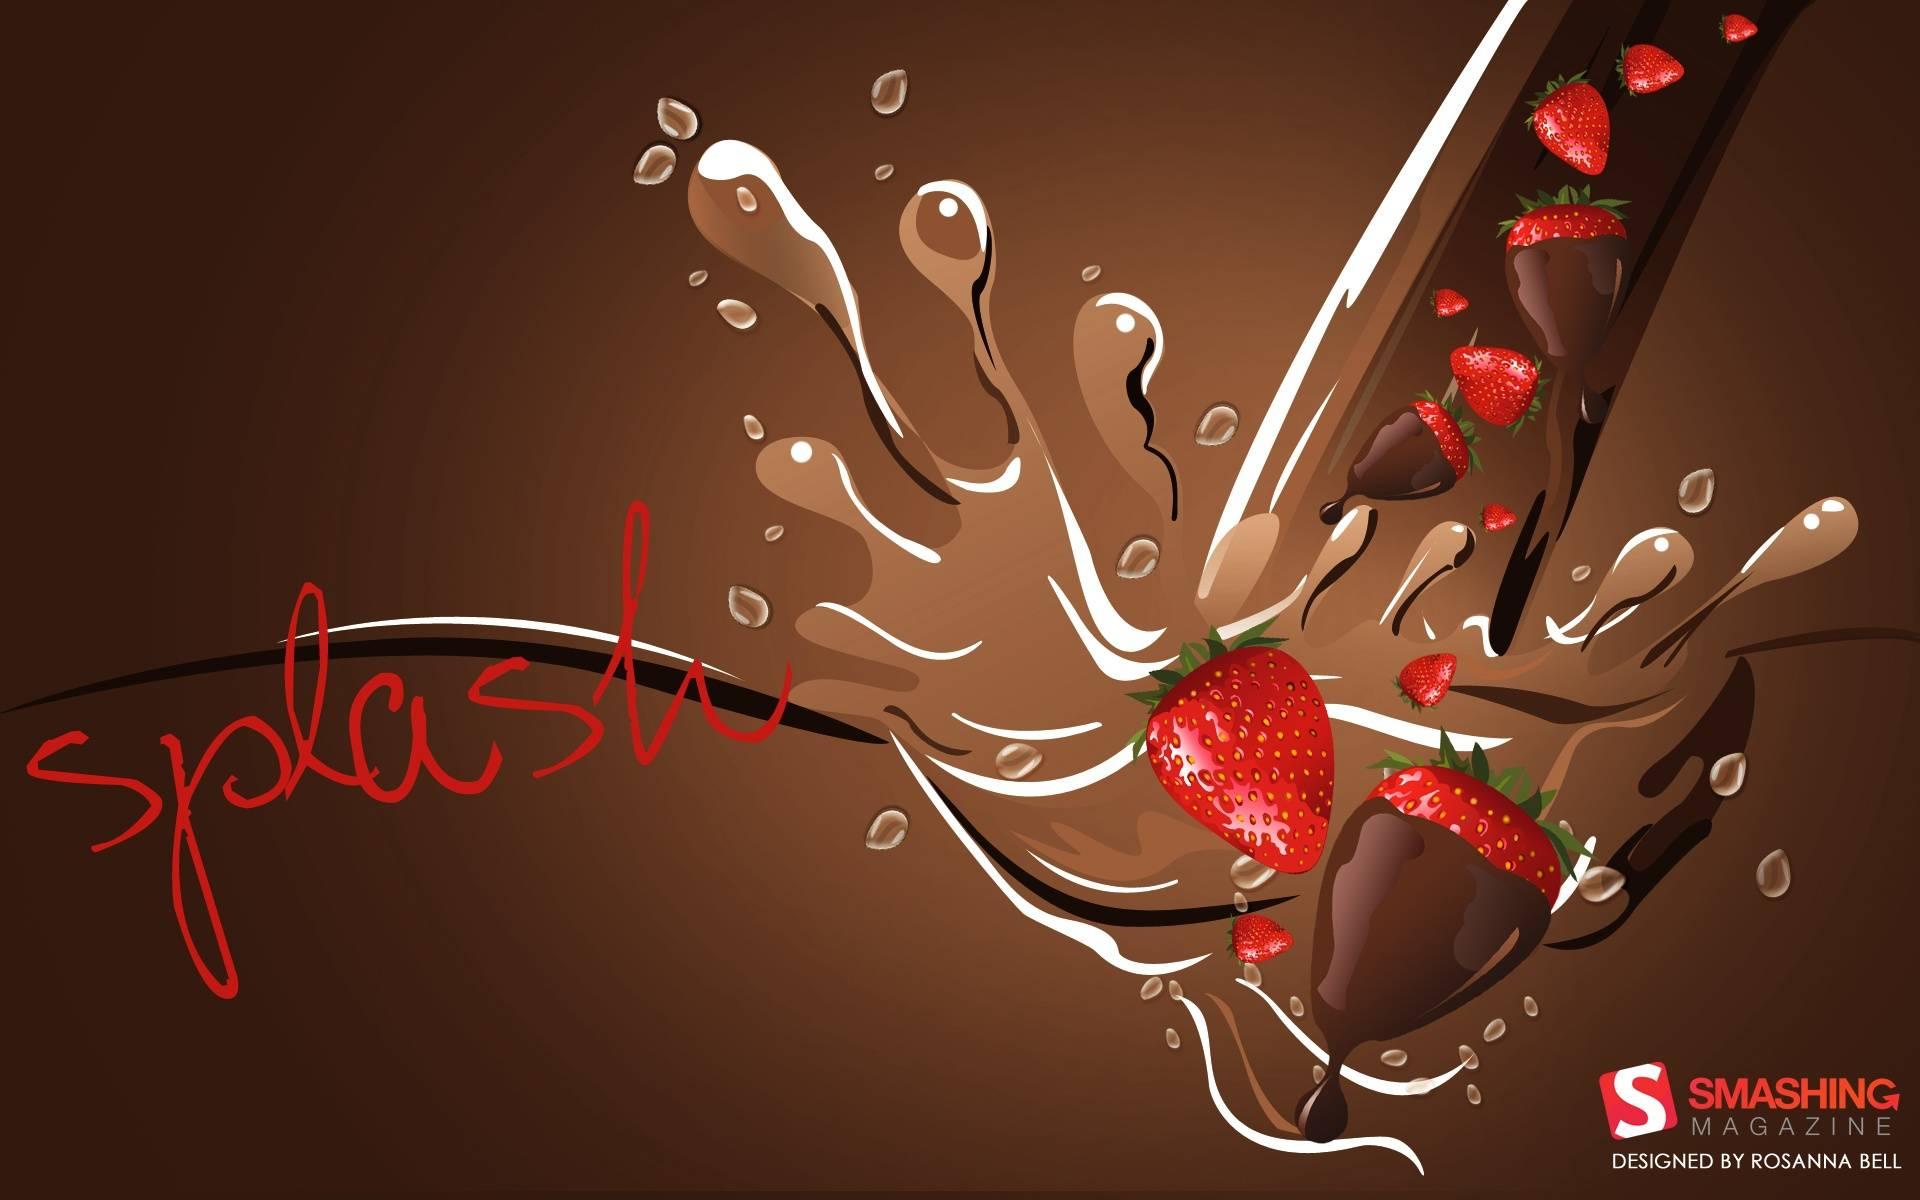 Chocolate wallpaper 1920x1200 Wallpaper of Chocolate and strawberries 1920x1200